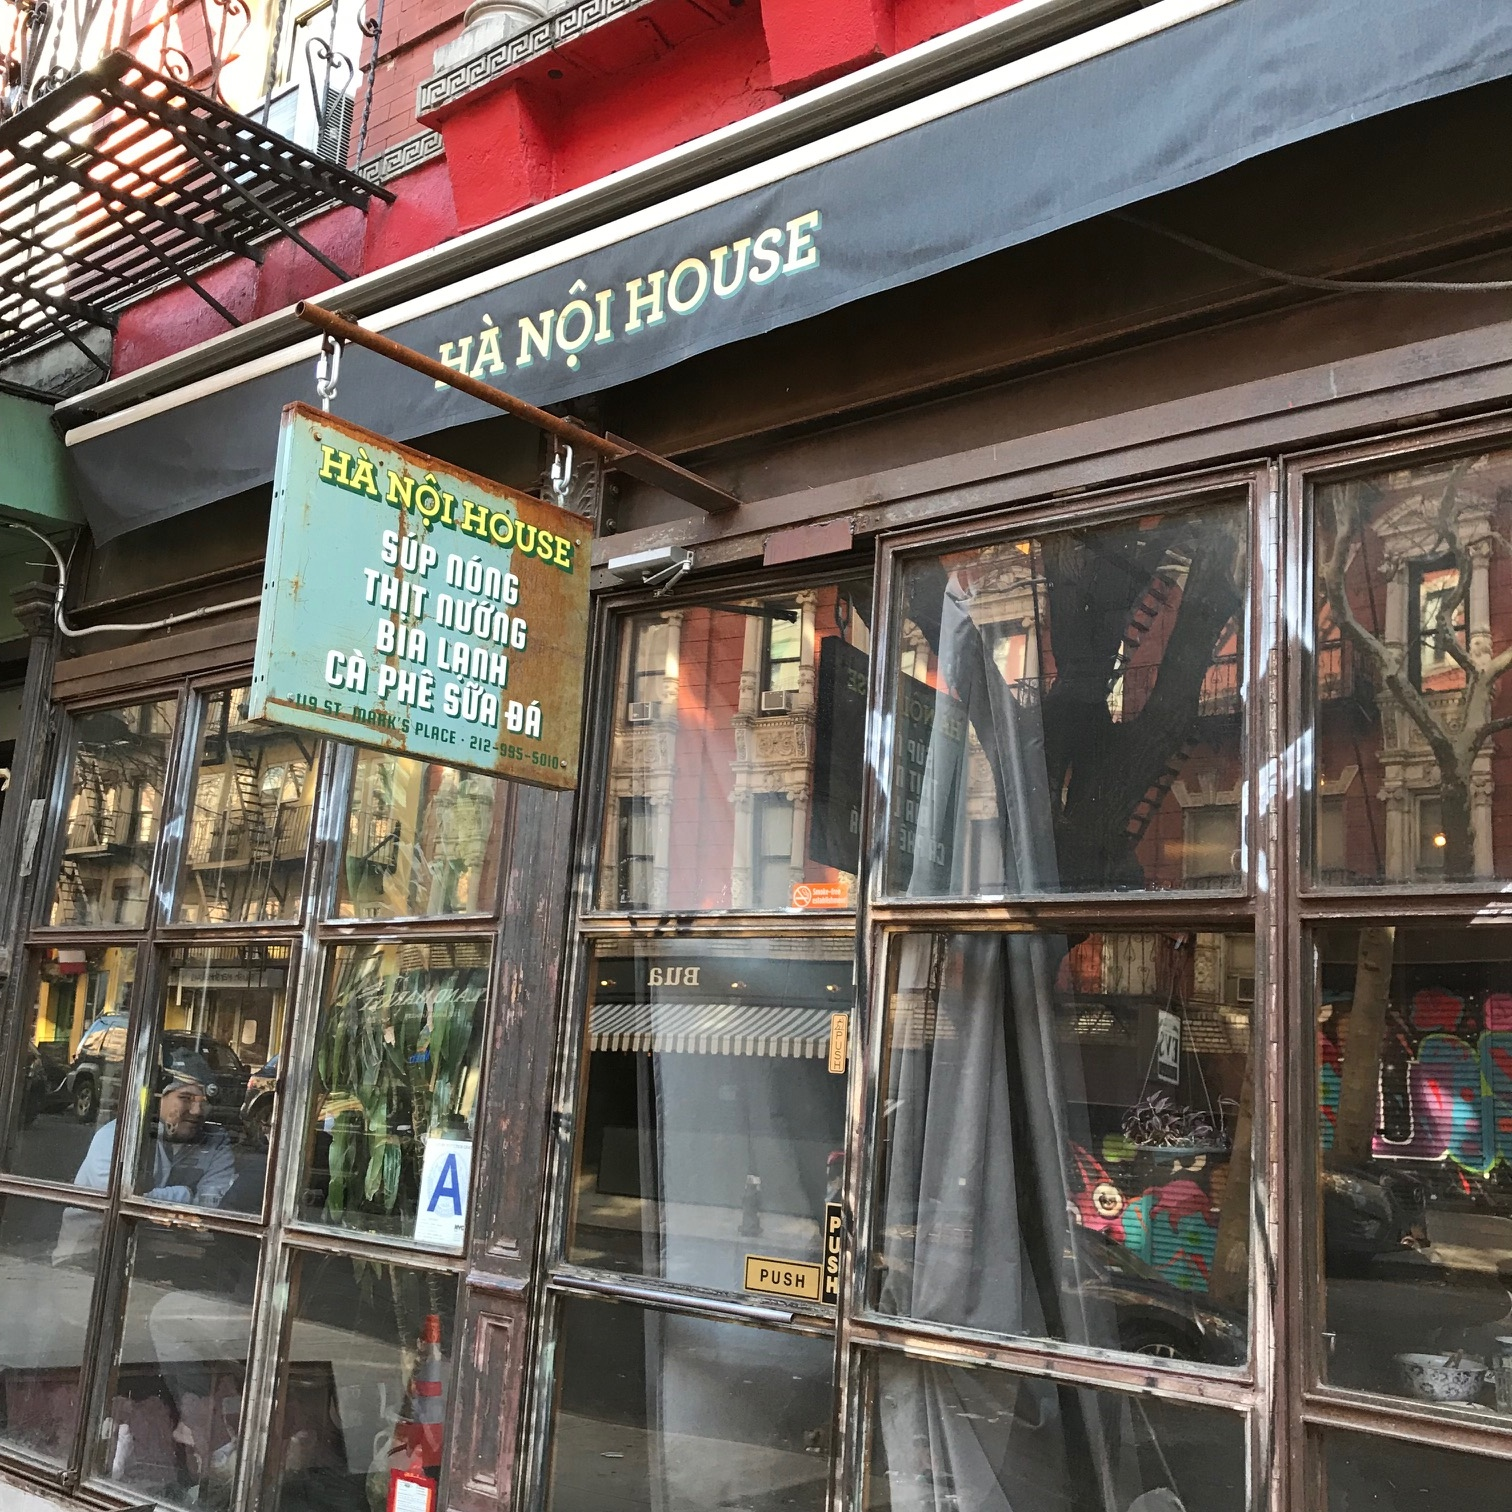 Hanoi House, You Had Me At Hello…